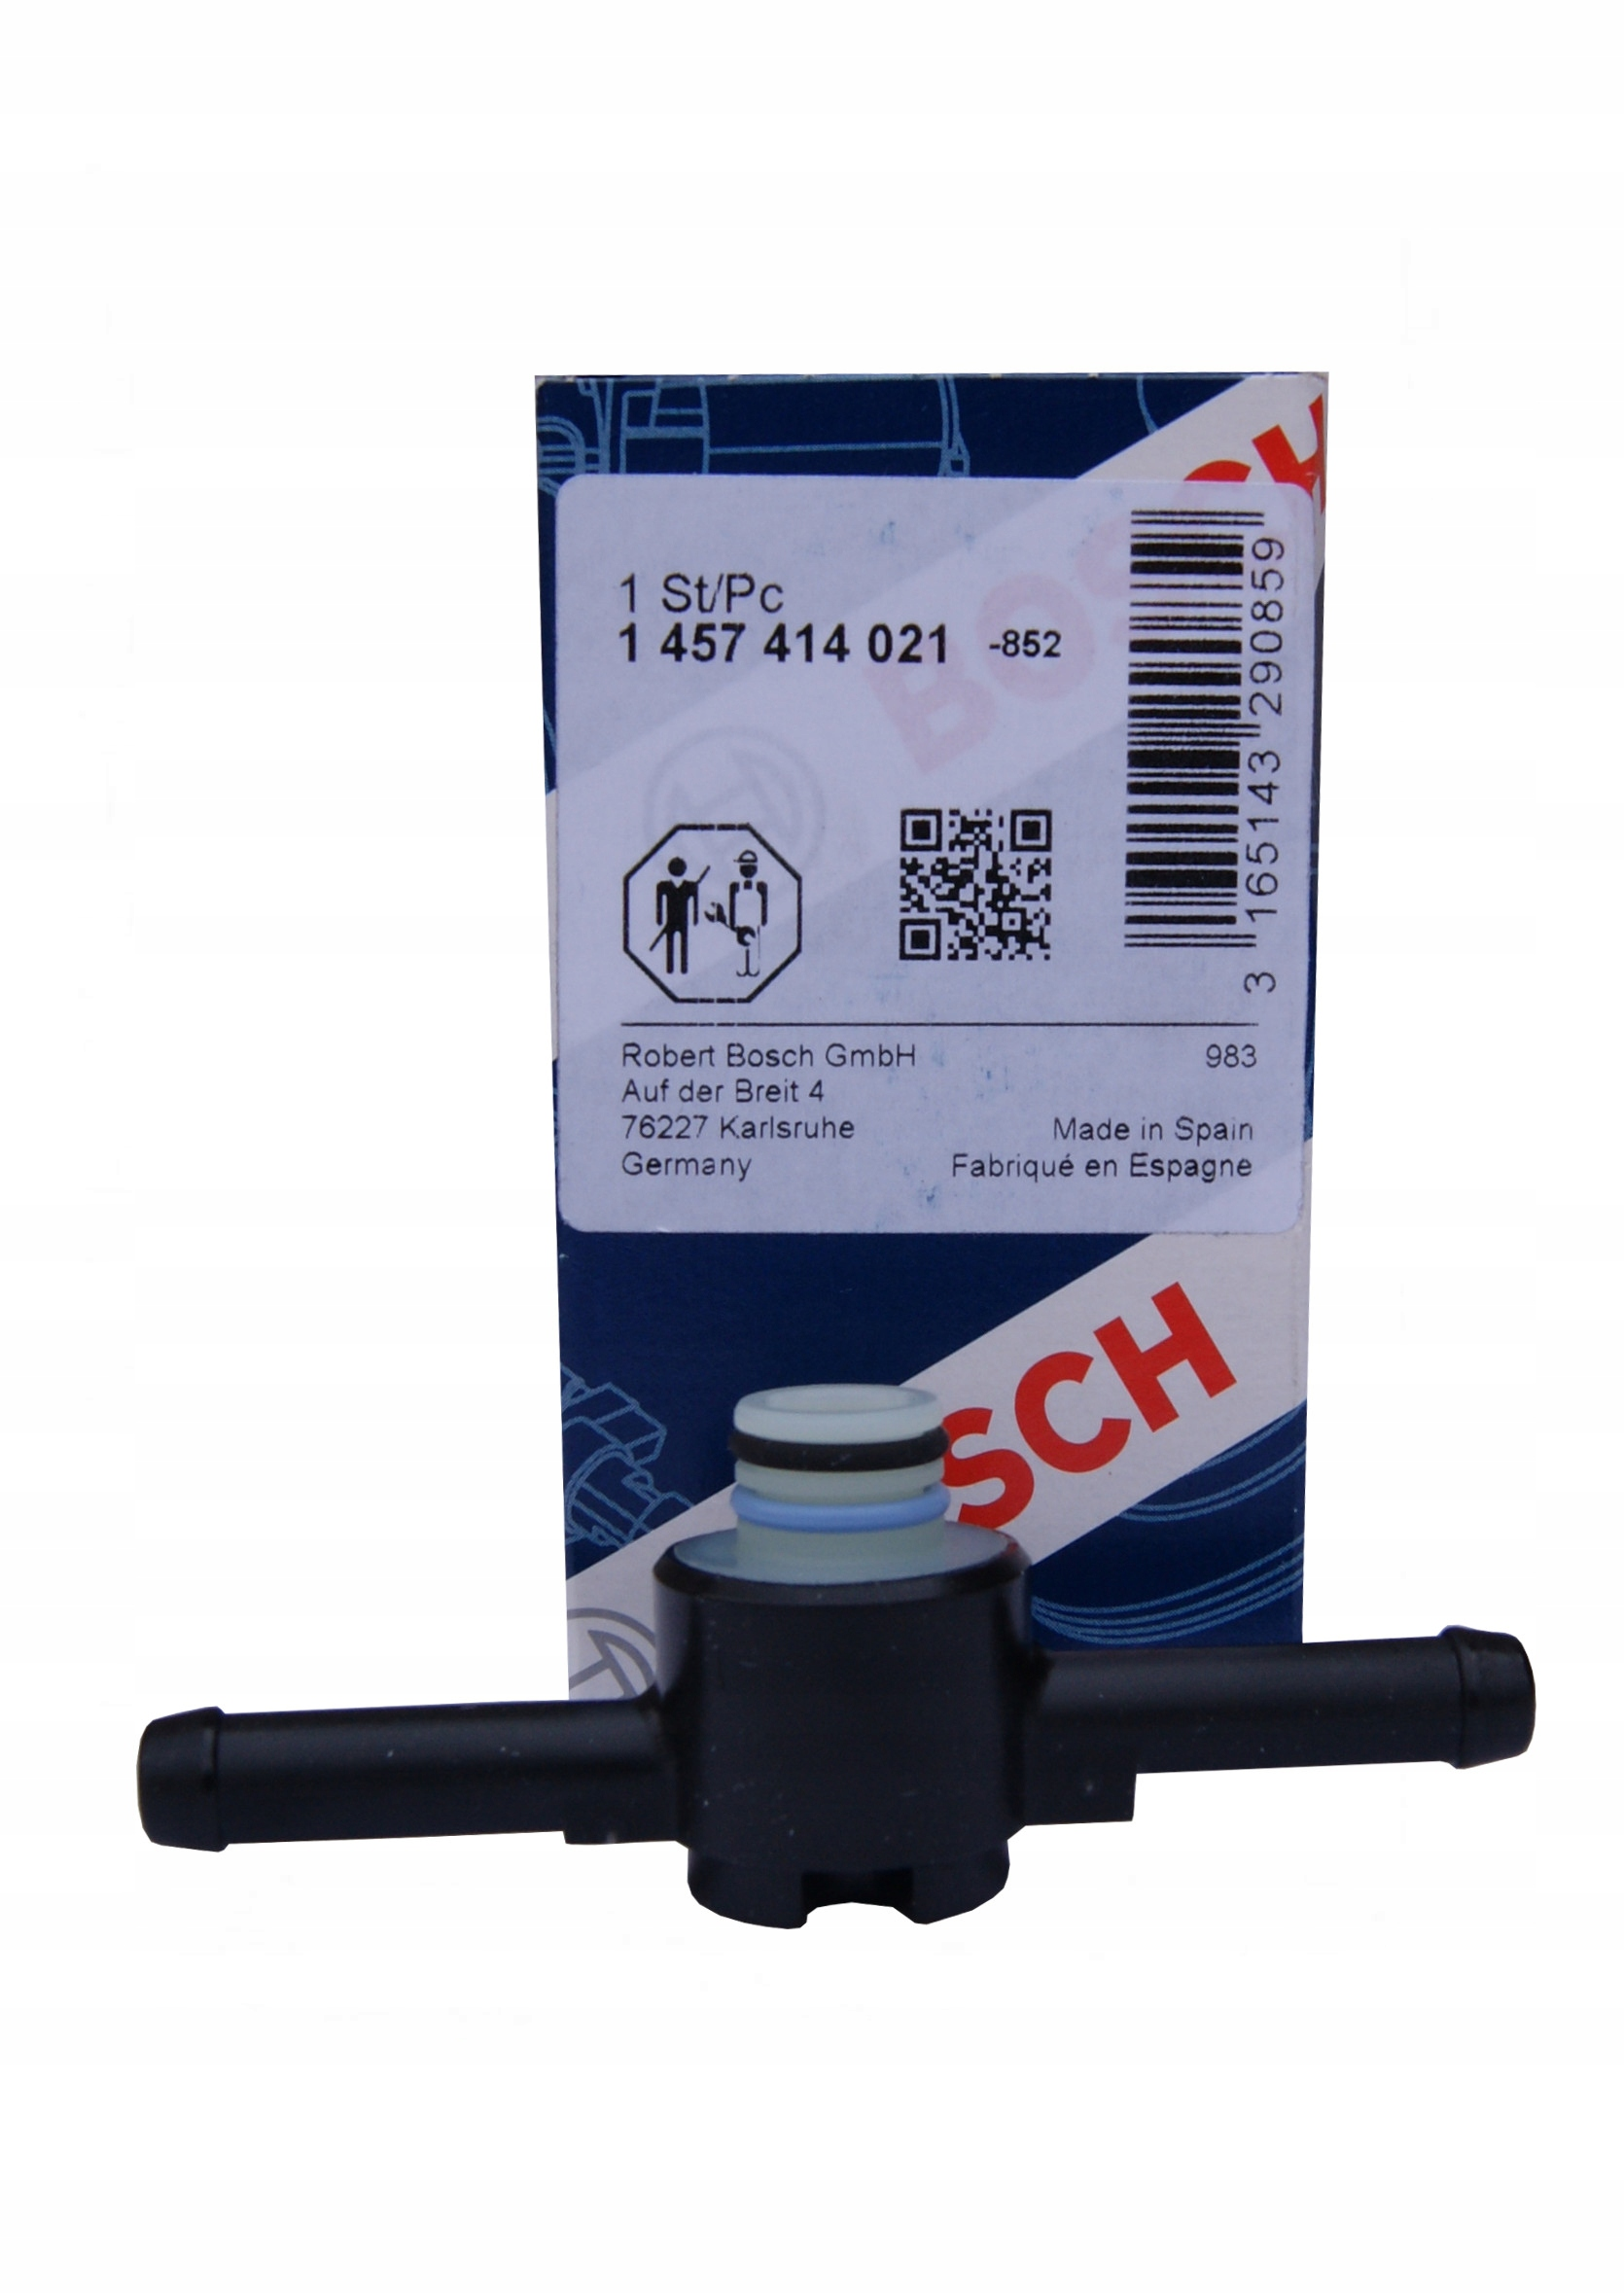 клапан маневренный топлива к audi a4 b5 b6 b7 19 tdi